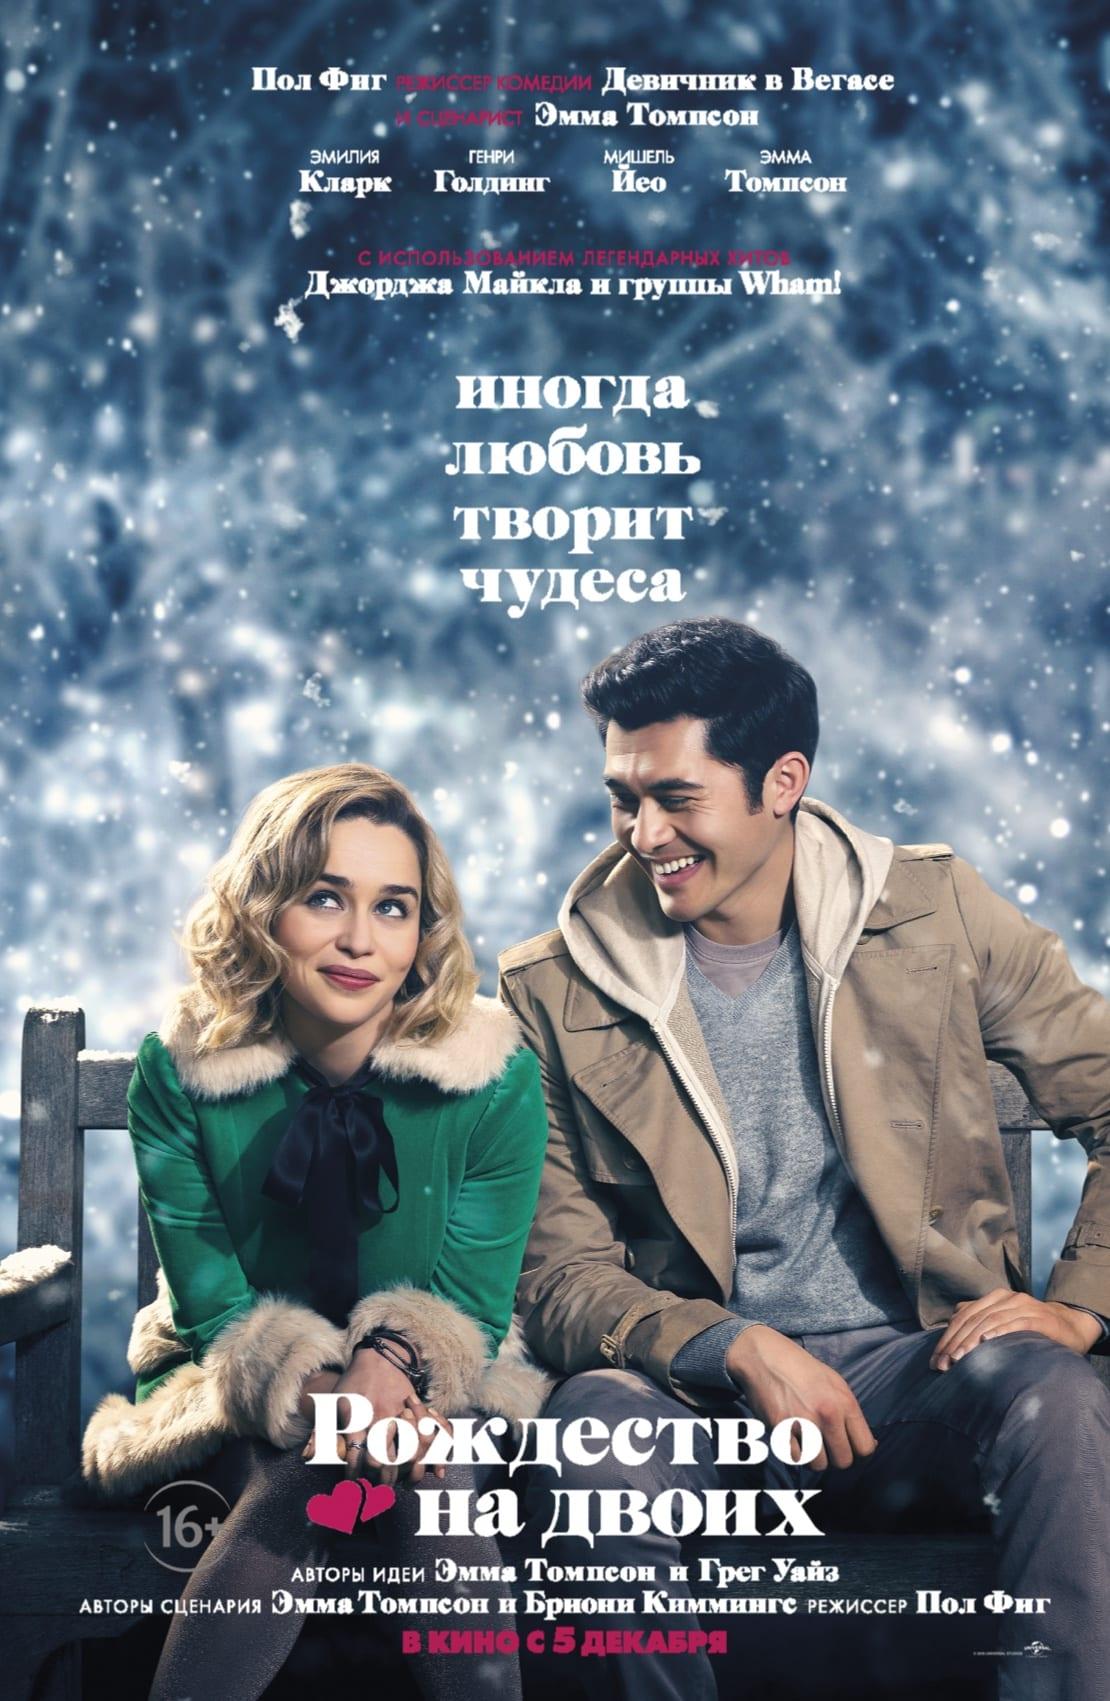 Poster image for Рождество На Двоих